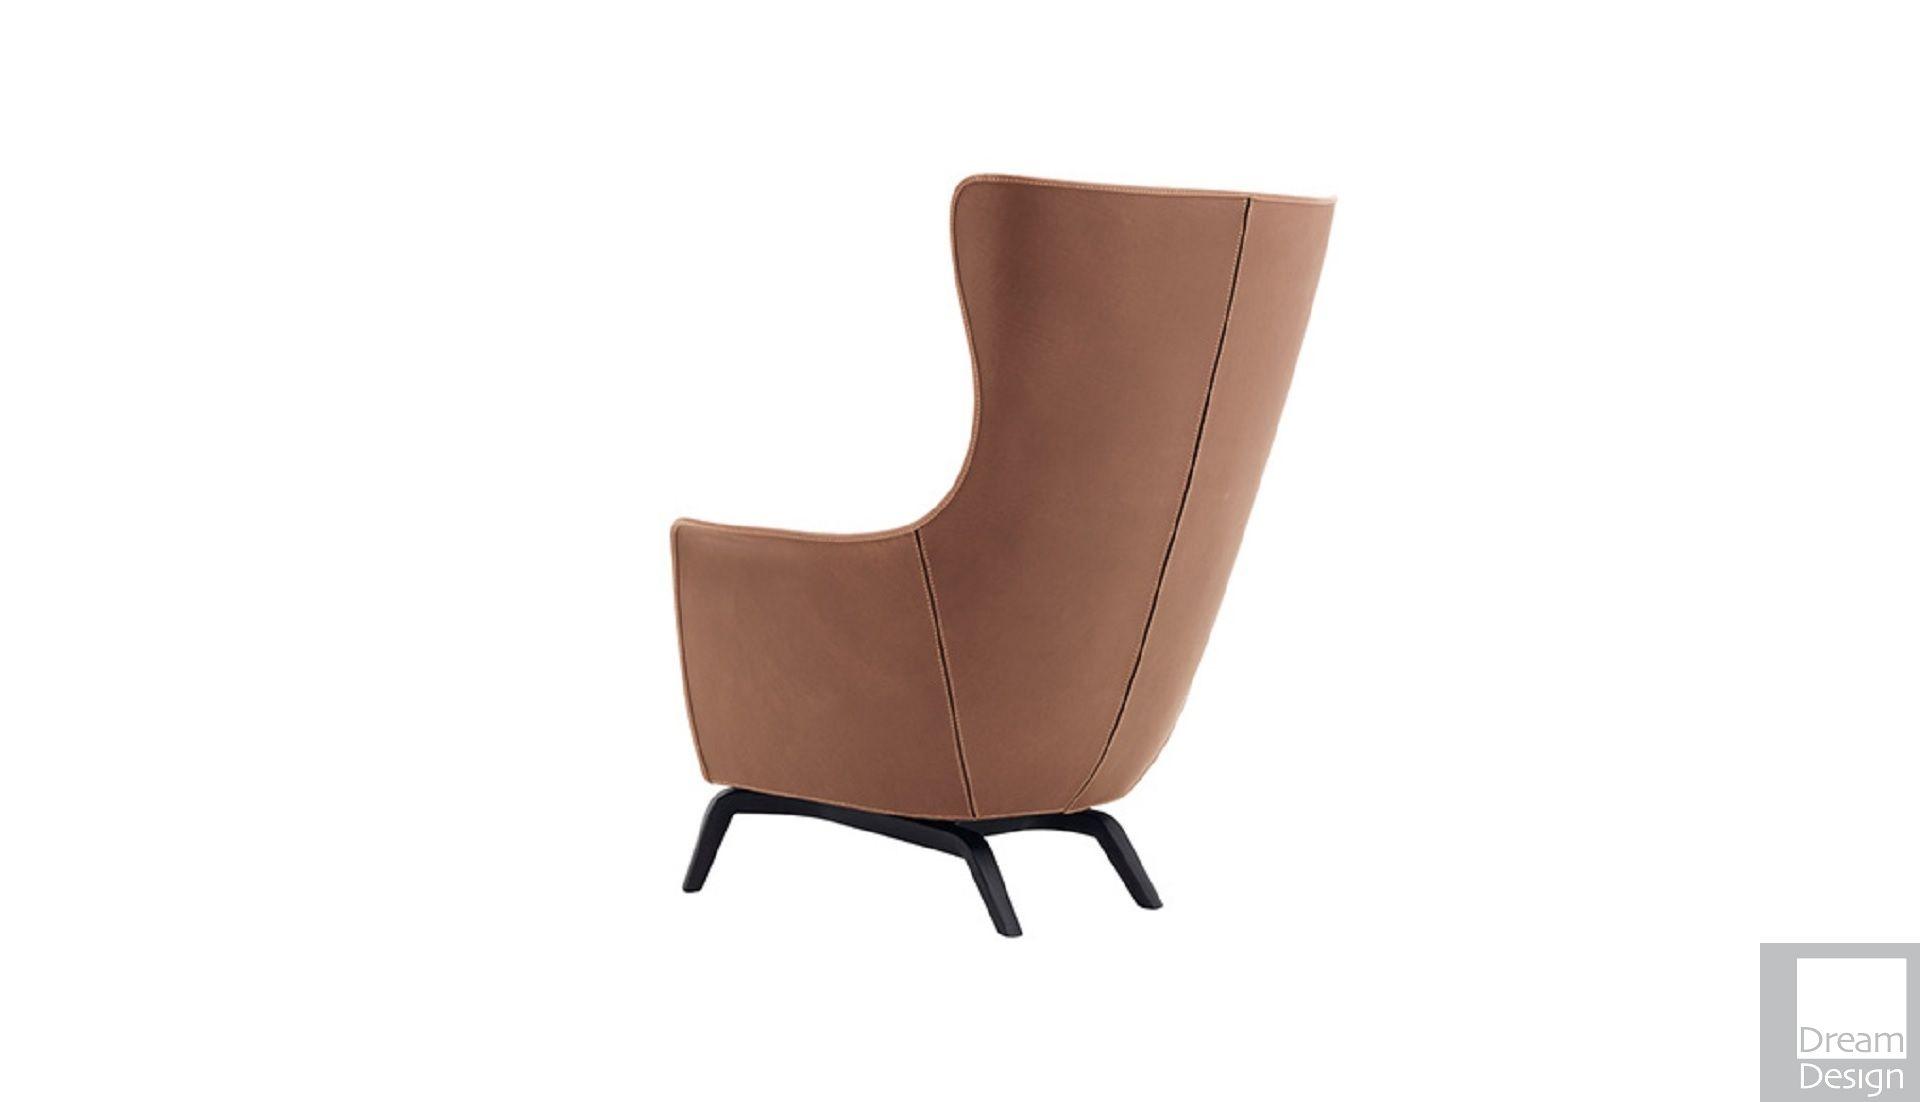 poltrona frau mamy blue armchair by roberto lazzeroni ebo. Black Bedroom Furniture Sets. Home Design Ideas